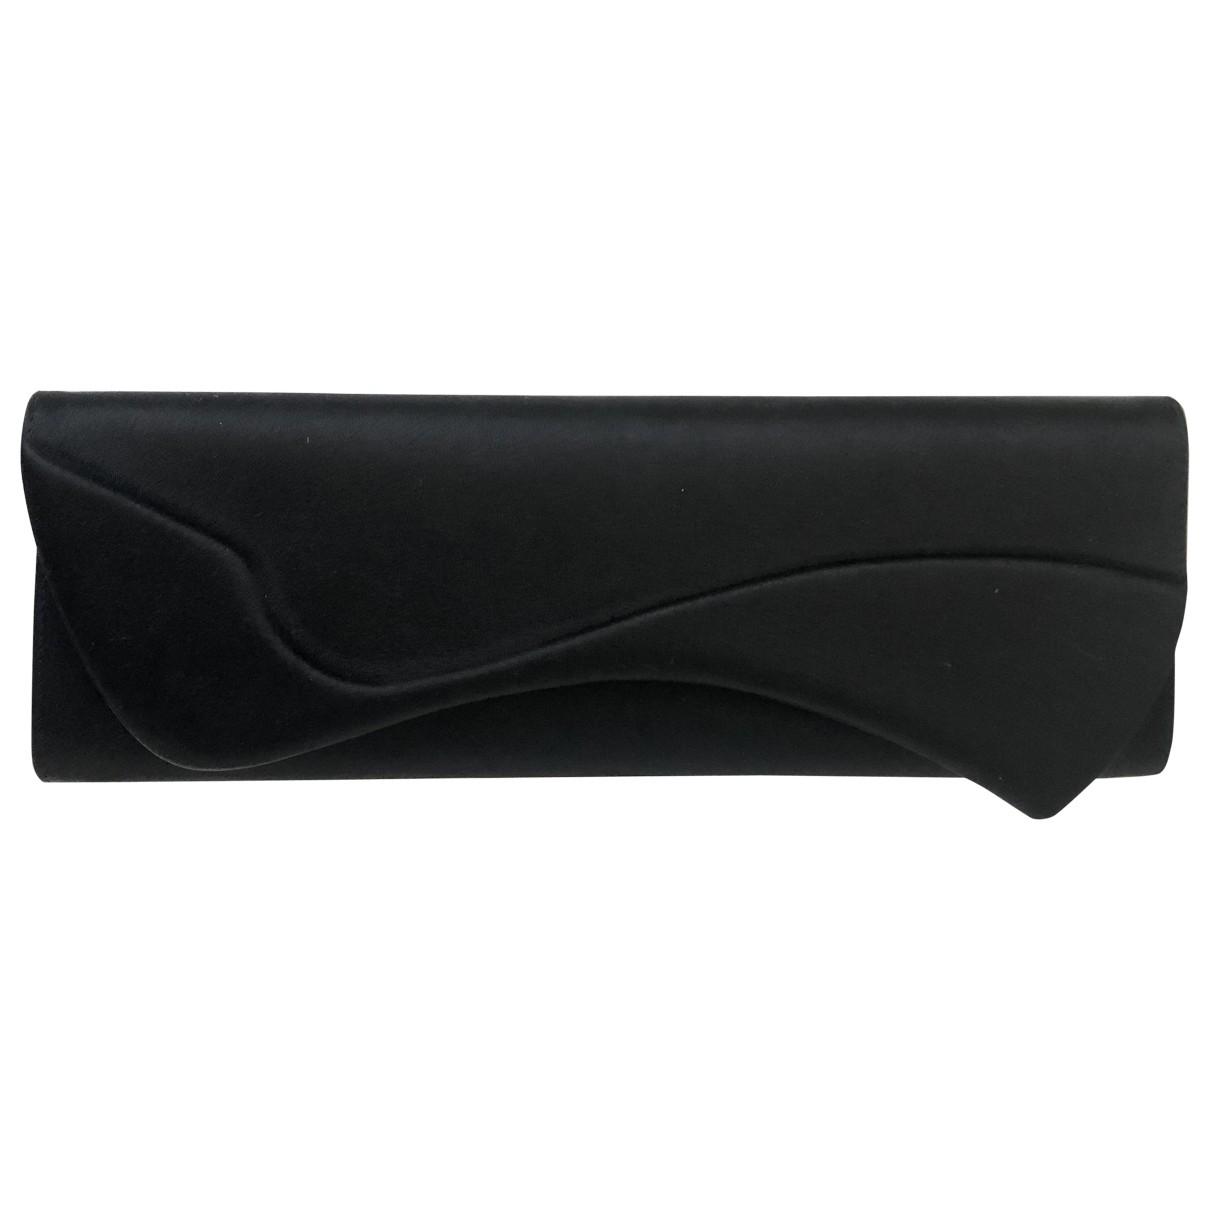 Christian Louboutin \N Black Silk Clutch bag for Women \N